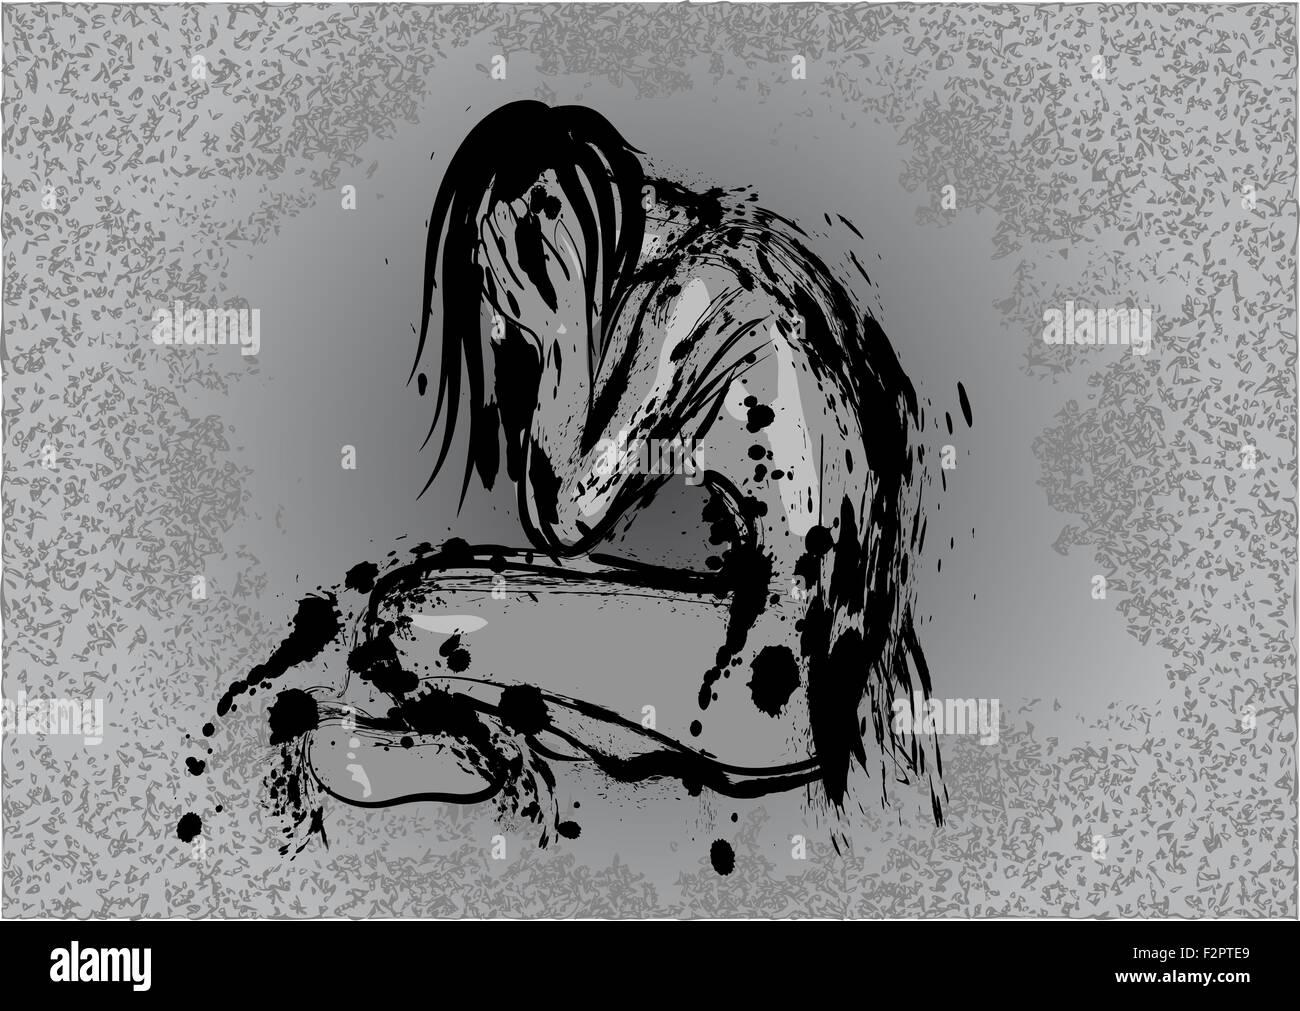 dark depression - Stock Image